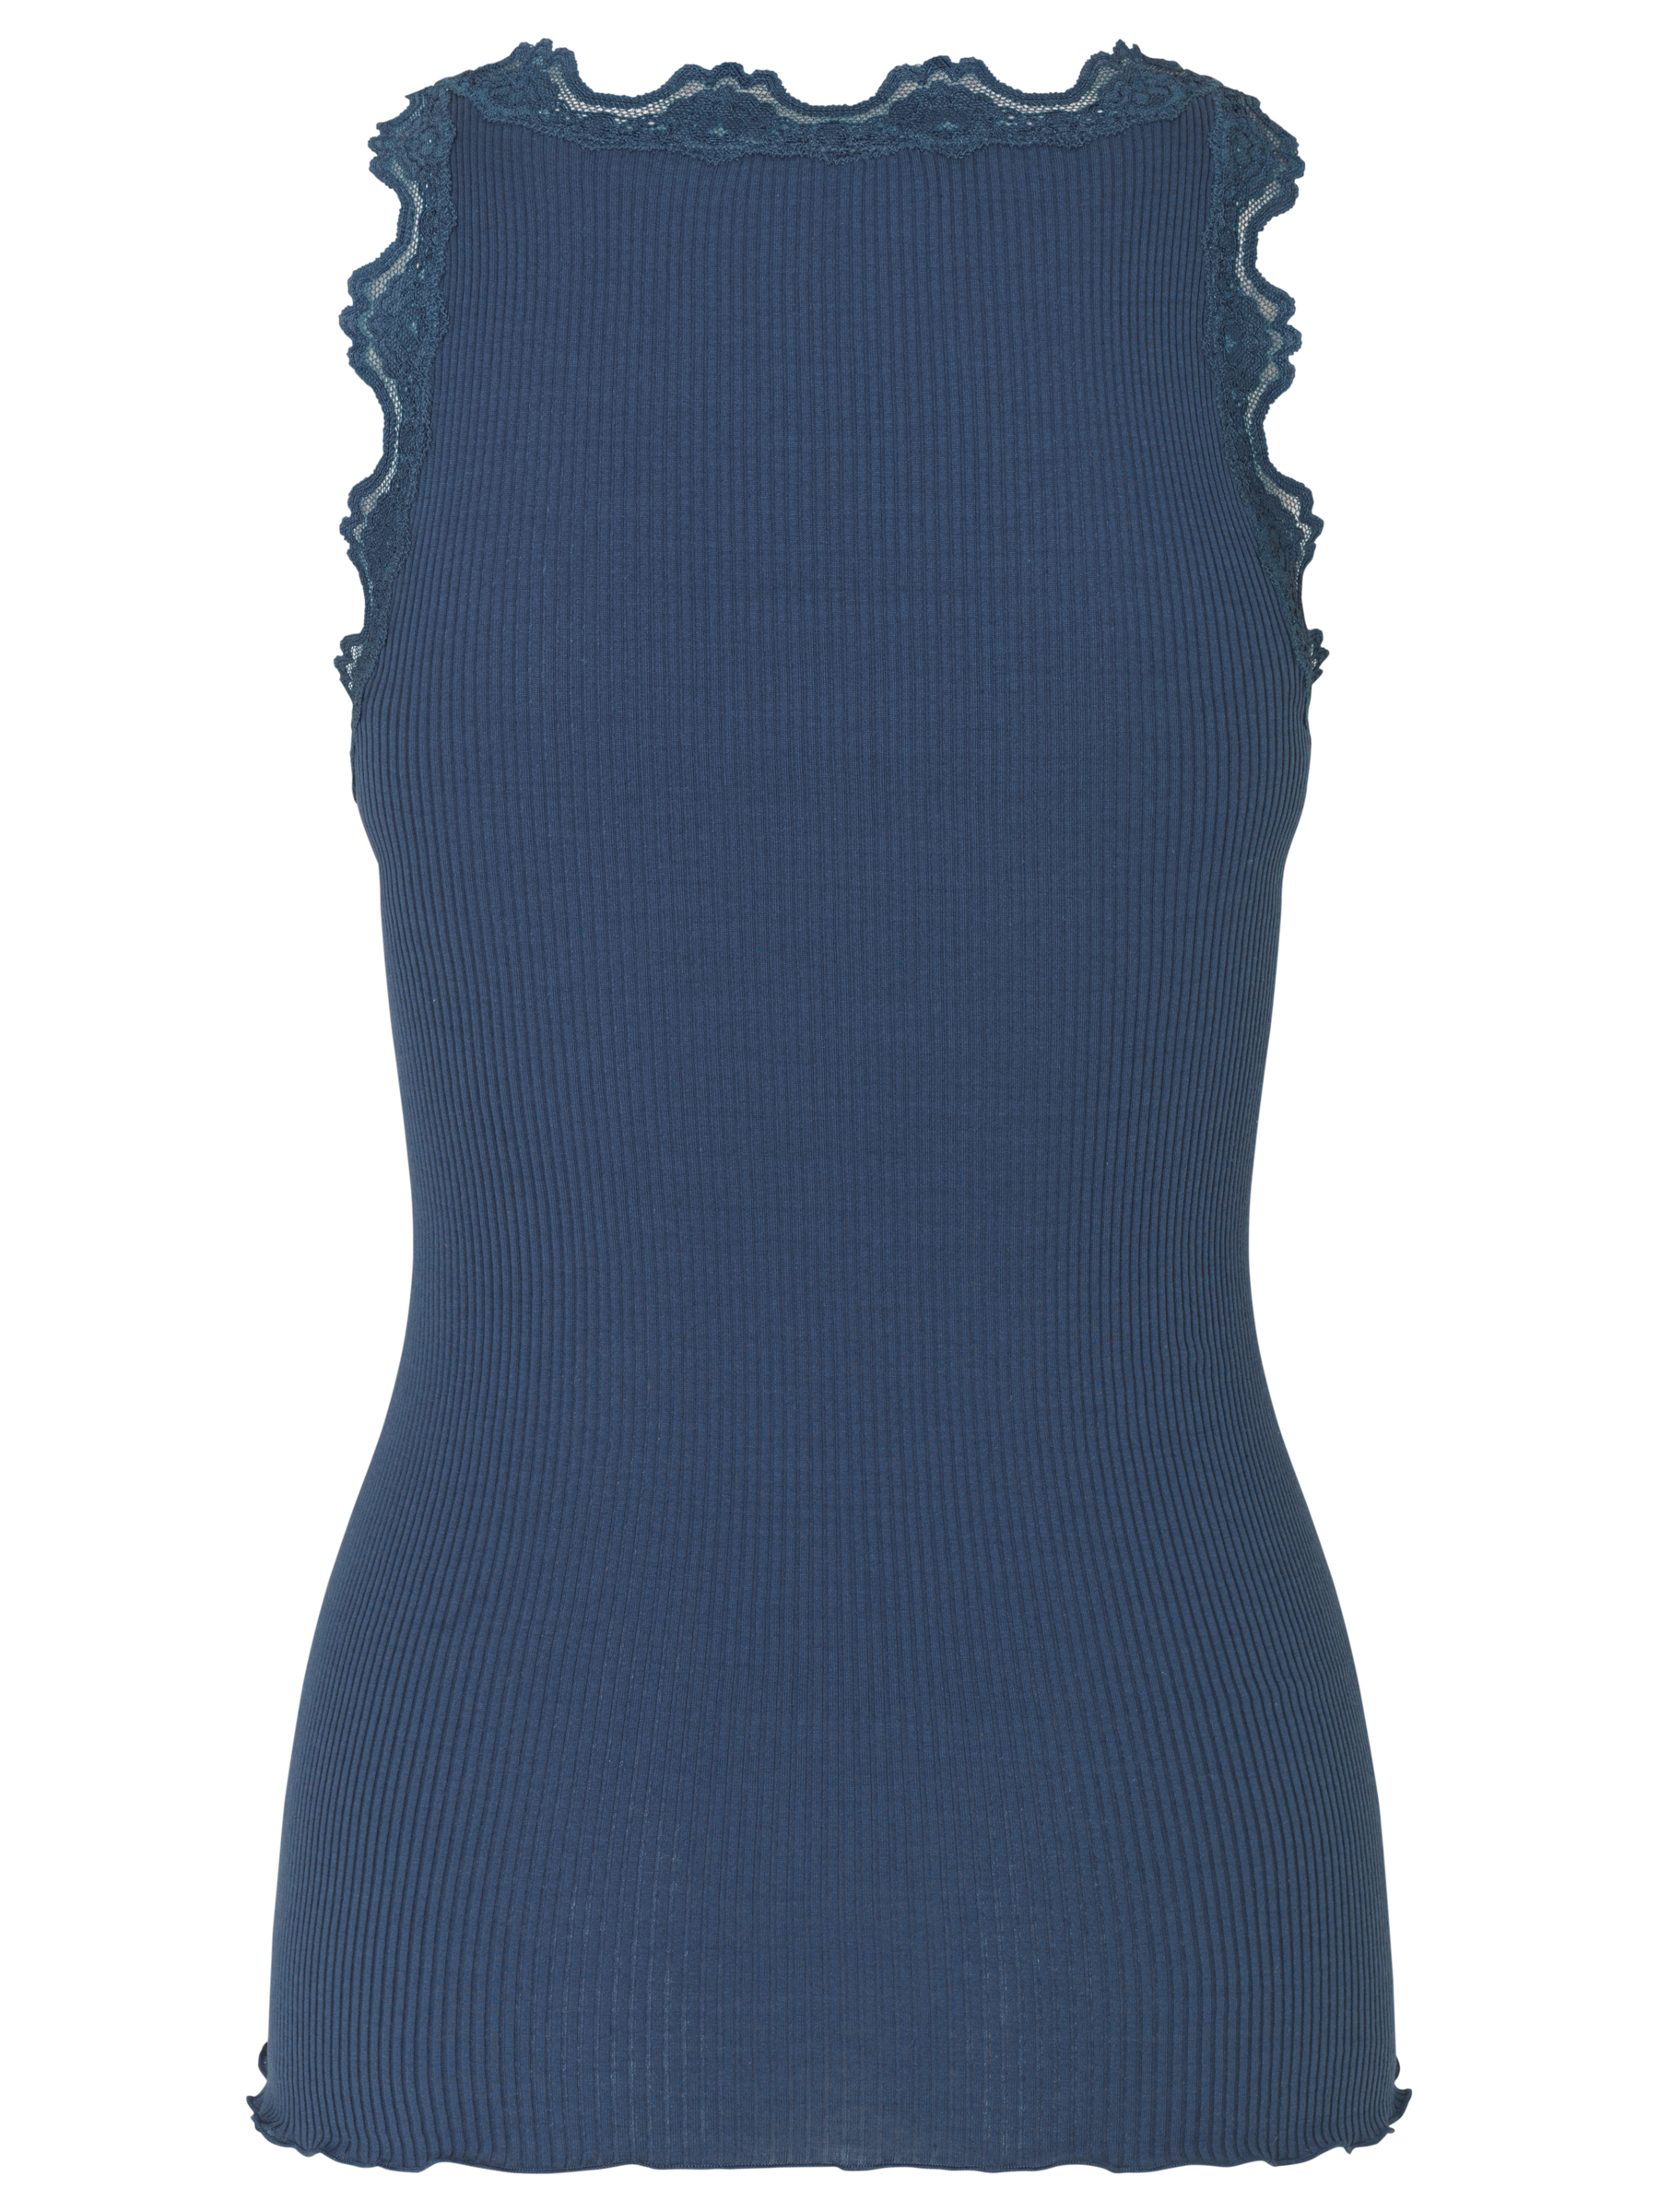 Rosemunde 5205 top, Denim blue, Small